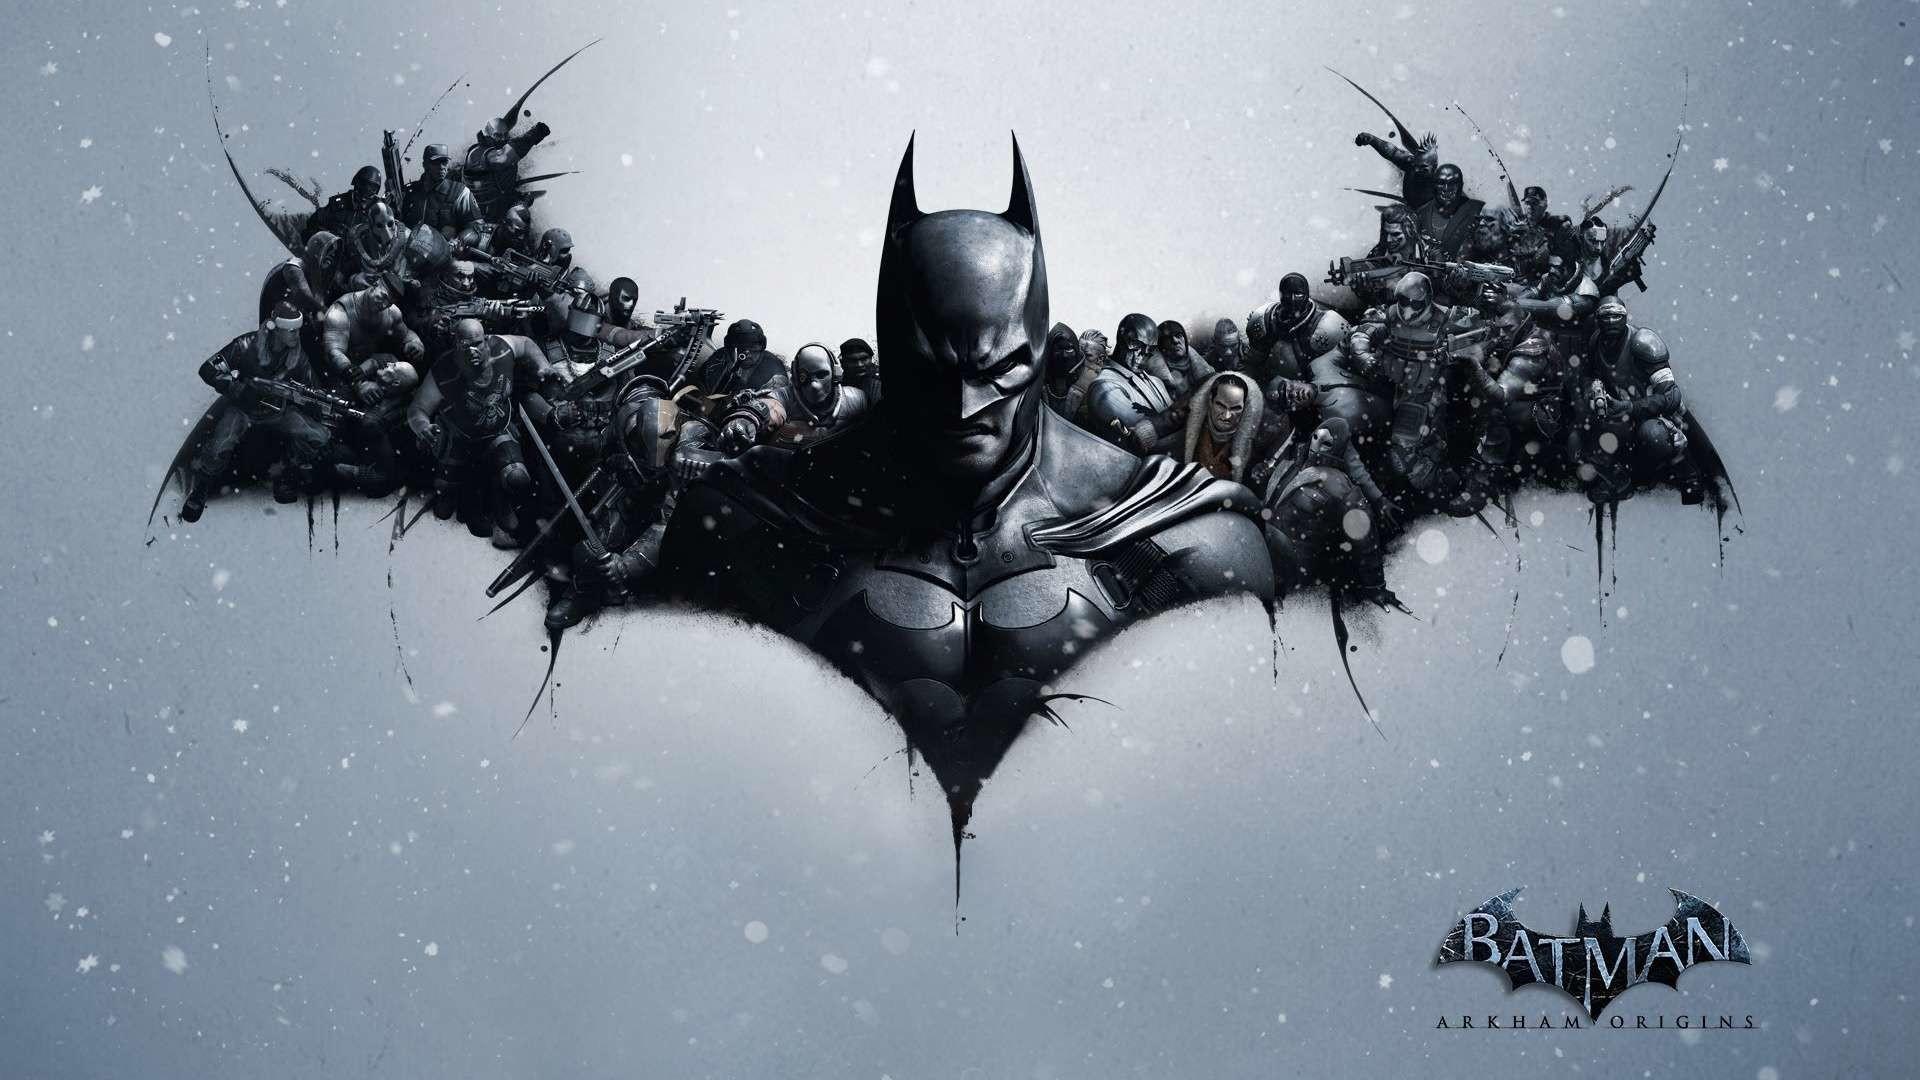 Batman Arkham Origins Video Game HD Wallpaper 1080p | HDWallWide